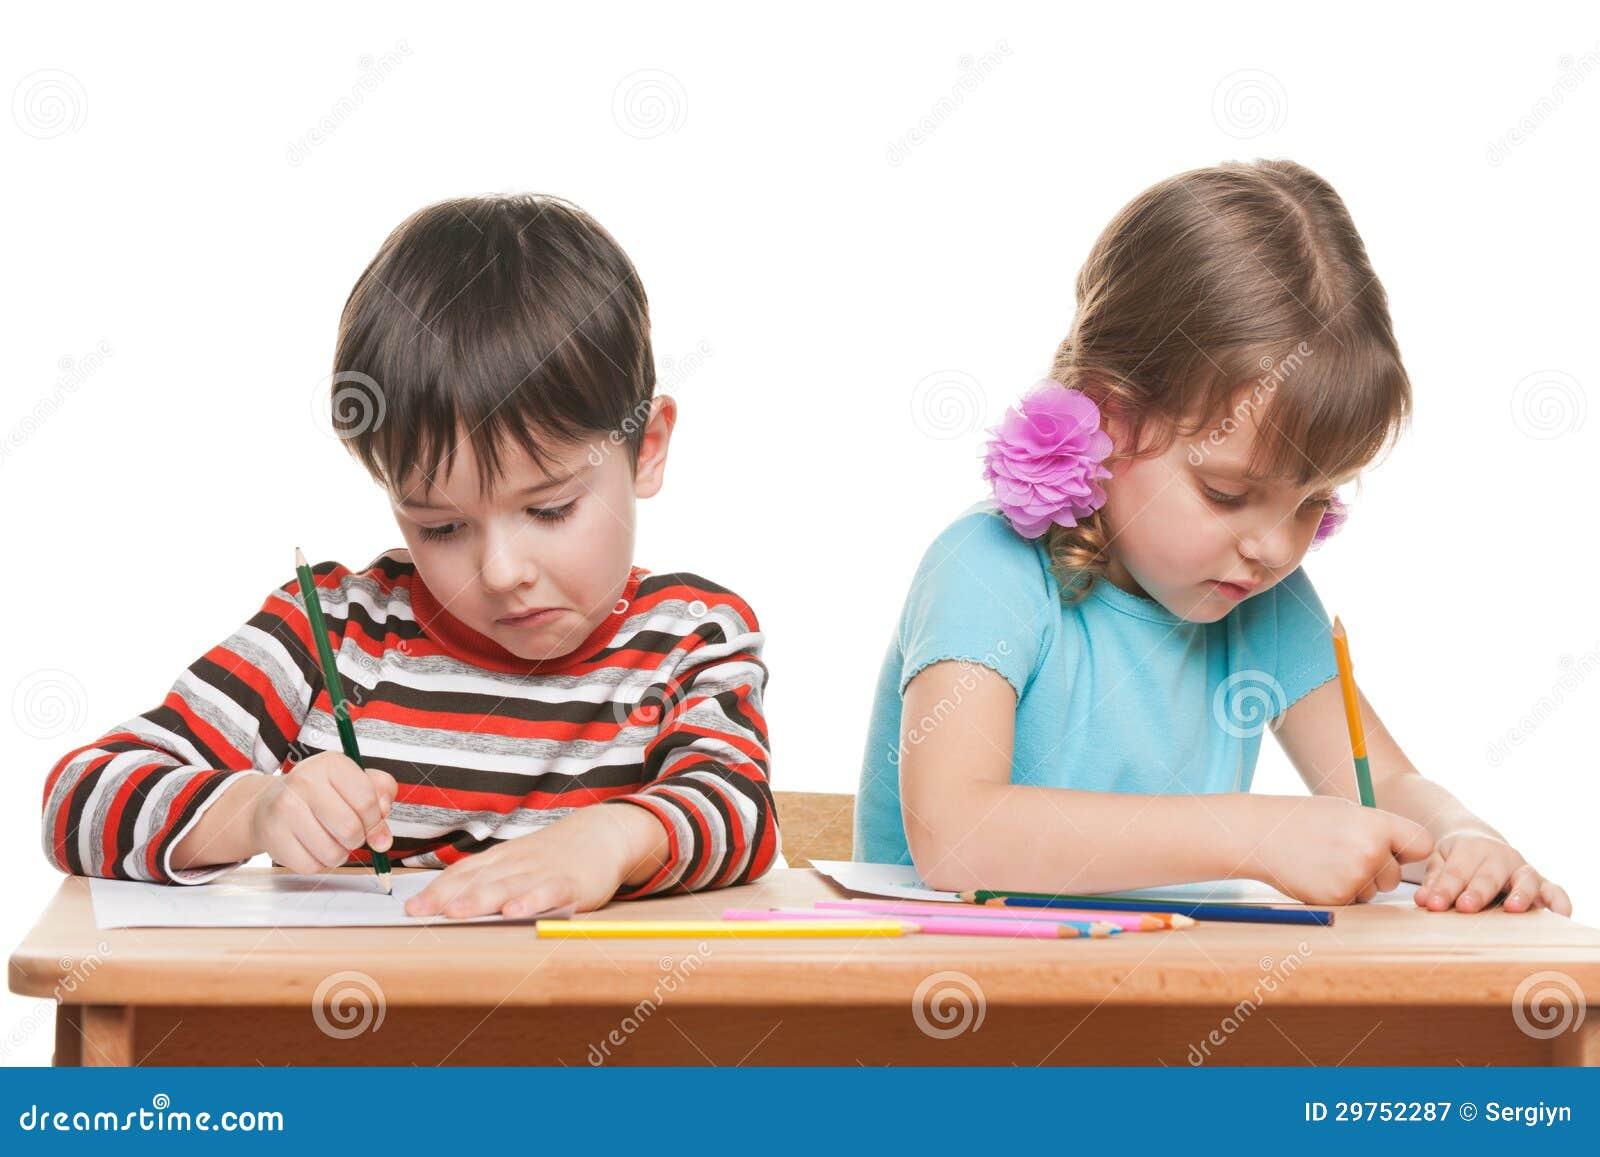 Student Reading: